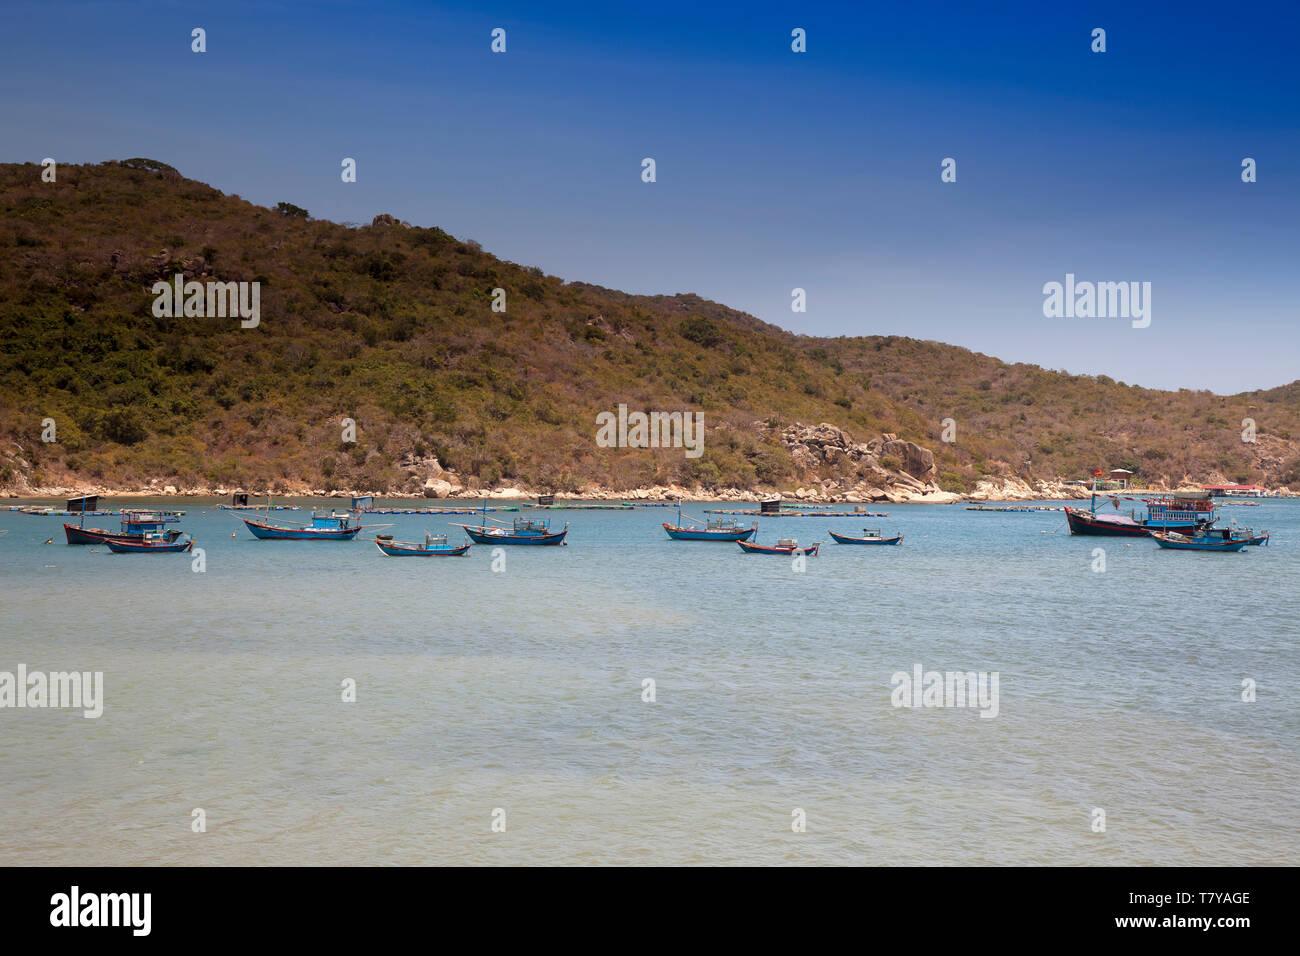 Landscape with fishing boats ,bay at Vinh Hy, South China Sea,Ninh Thuan, Vietnam,asia - Stock Image